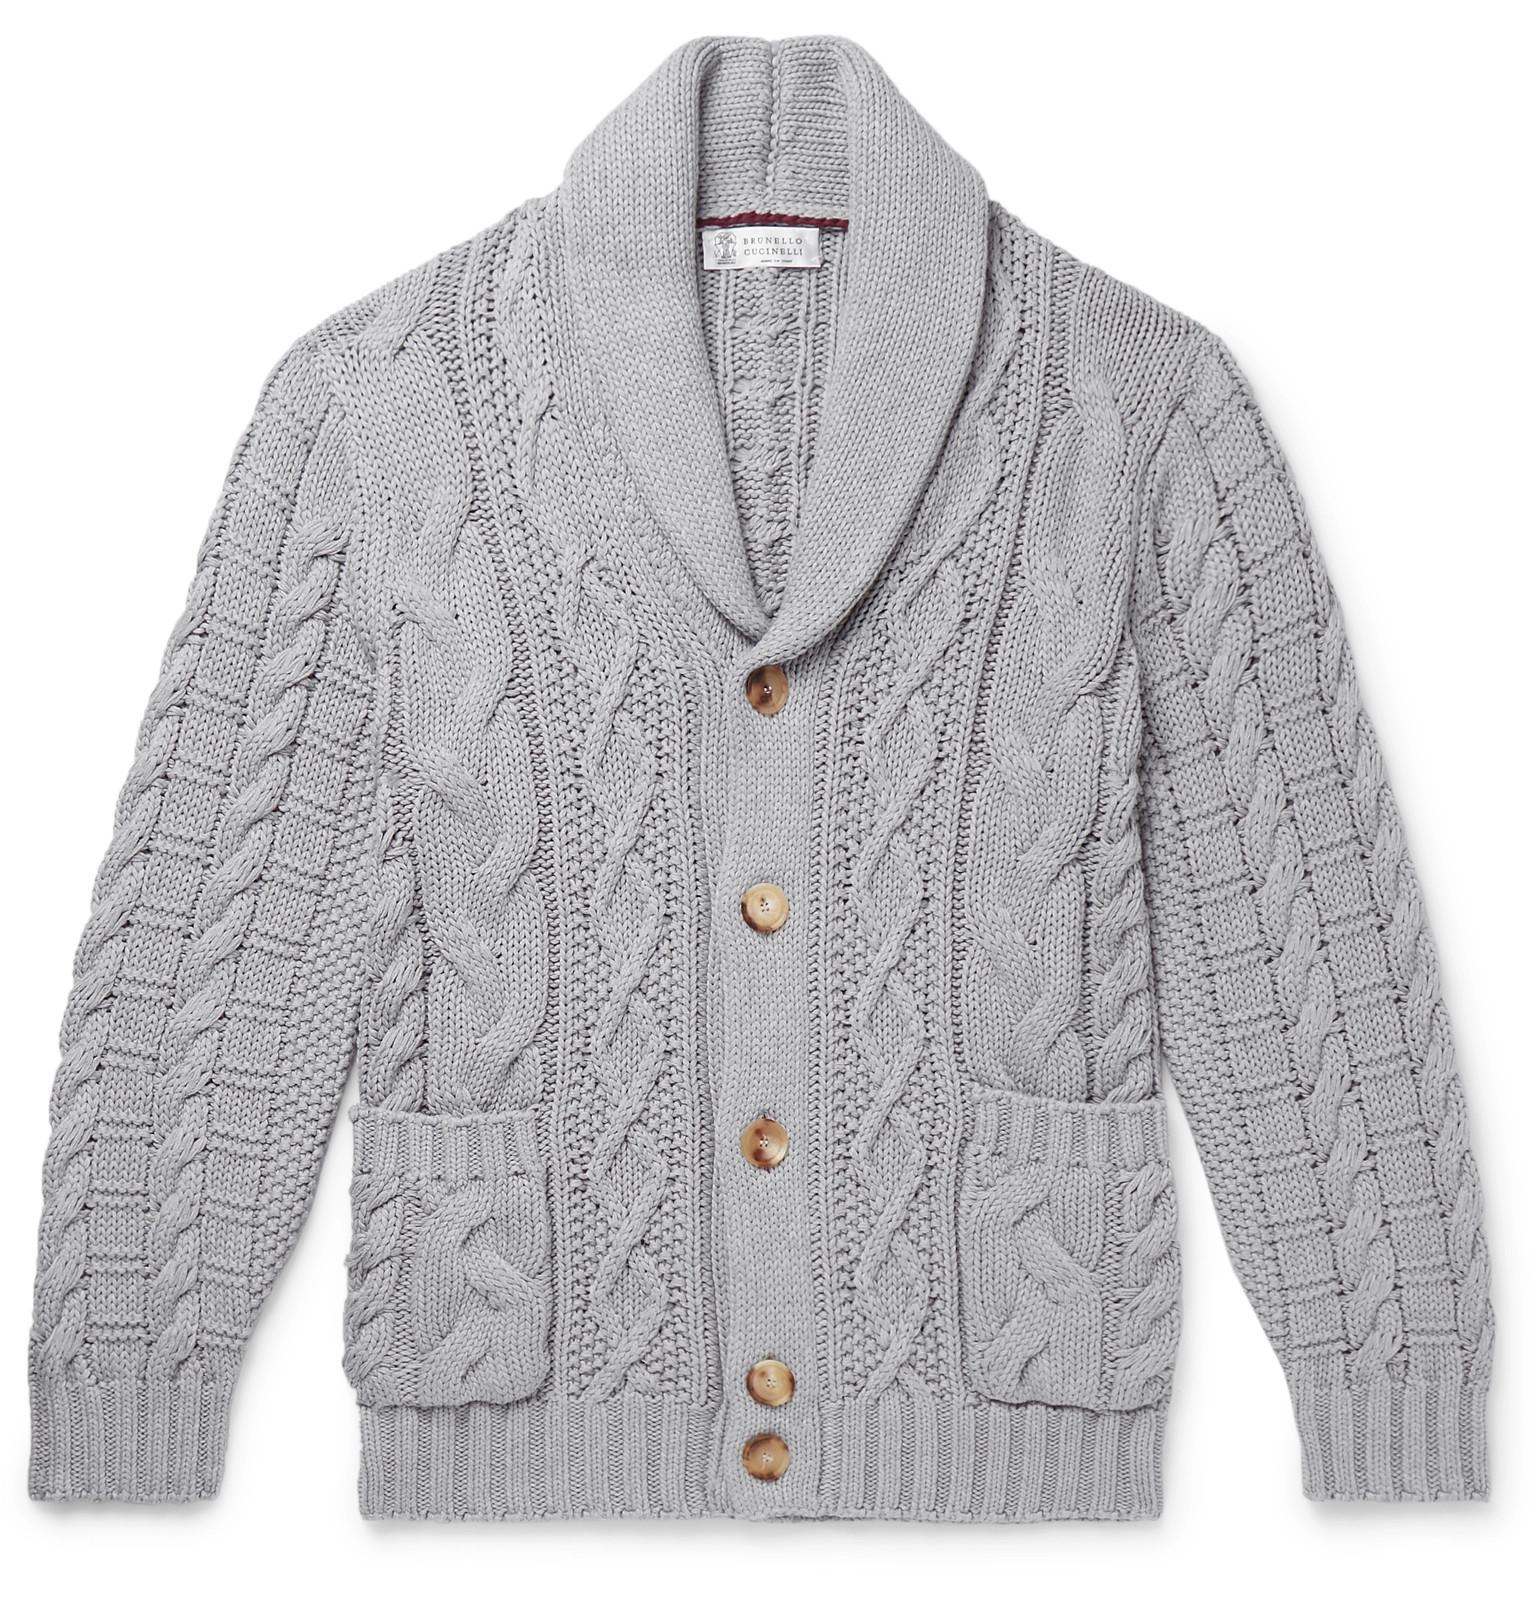 1013dee735 Brunello Cucinelli - Shawl-Collar Cable-Knit Cotton Cardigan